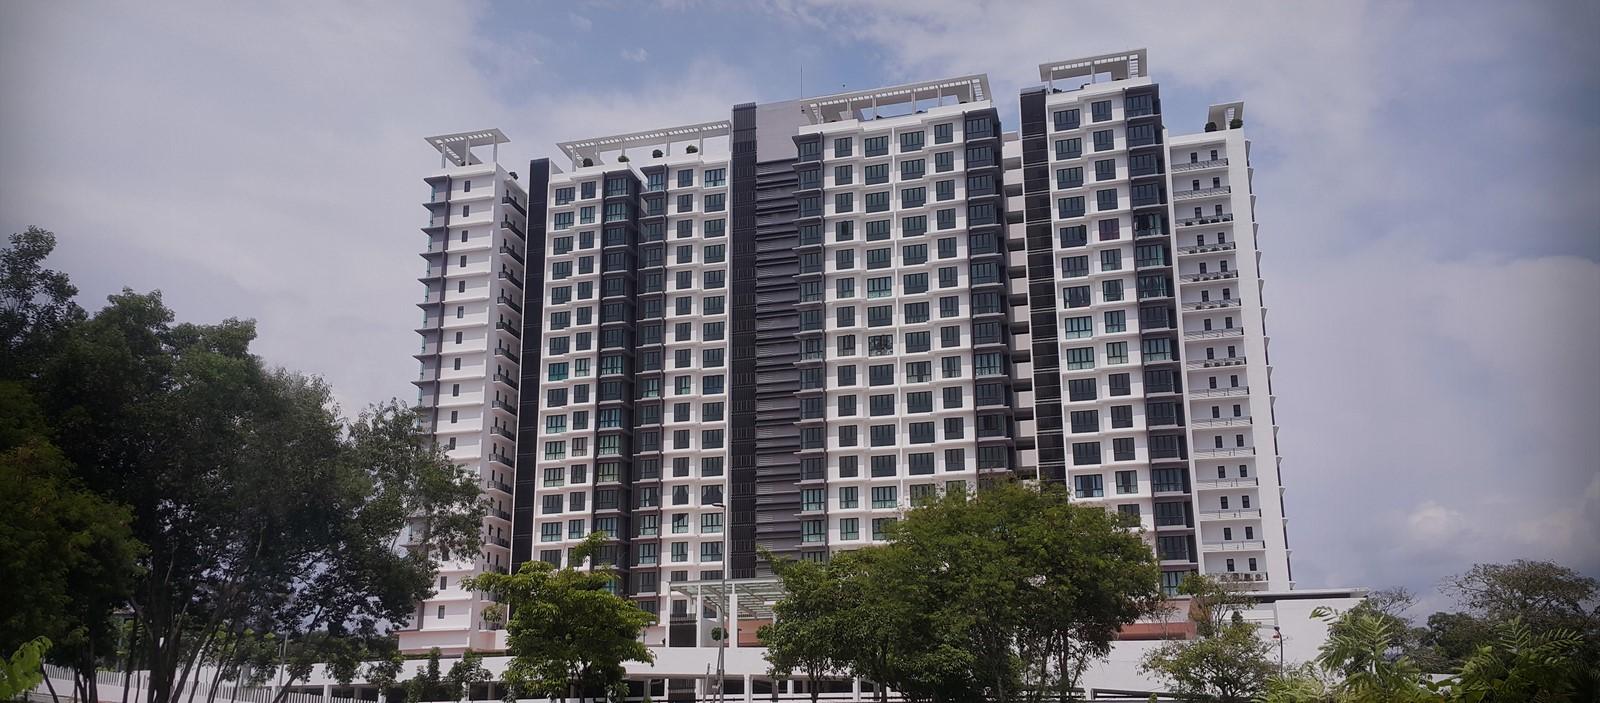 Architects in Petaling Jaya - Top 45 Architects in Petaling Jaya - Sheet16